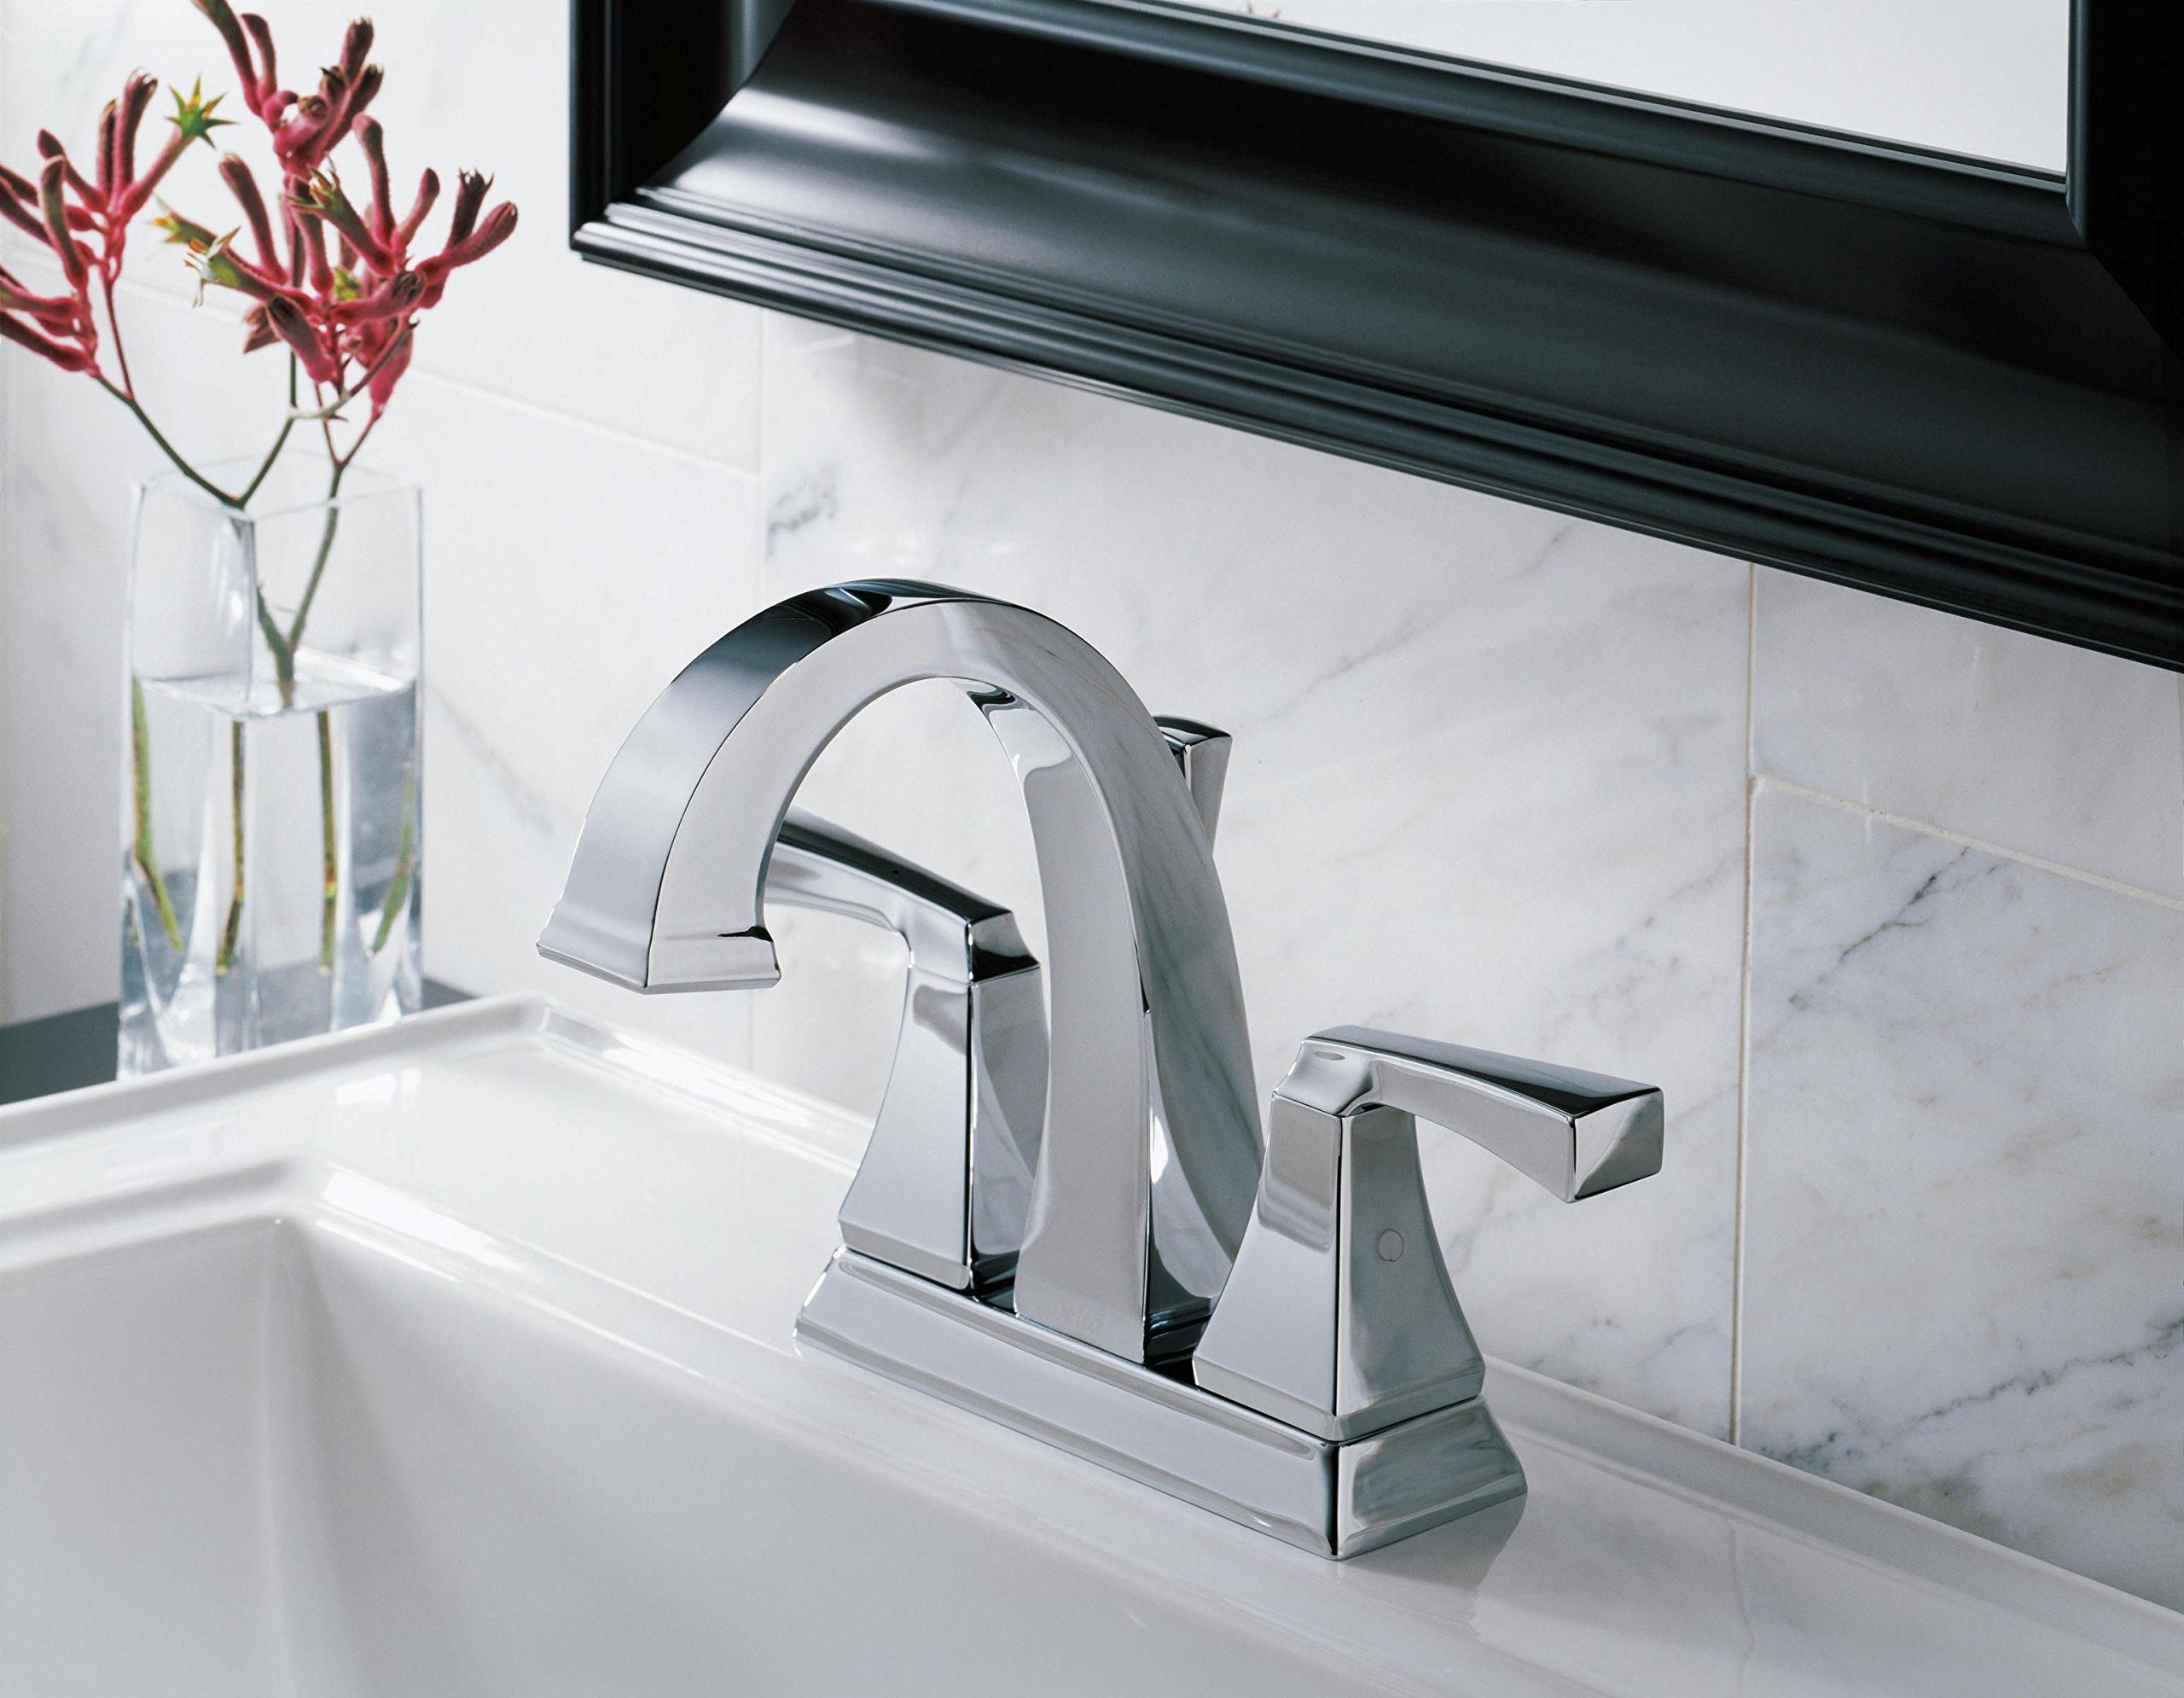 Delta Faucet Dryden Centerset Bathroom Faucet Chrome Bathroom Sink Faucet Diamond Seal Technology Metal Drain Assembly Chrome 2551 Mpu Dst Touch On Bathroom Sink Faucets